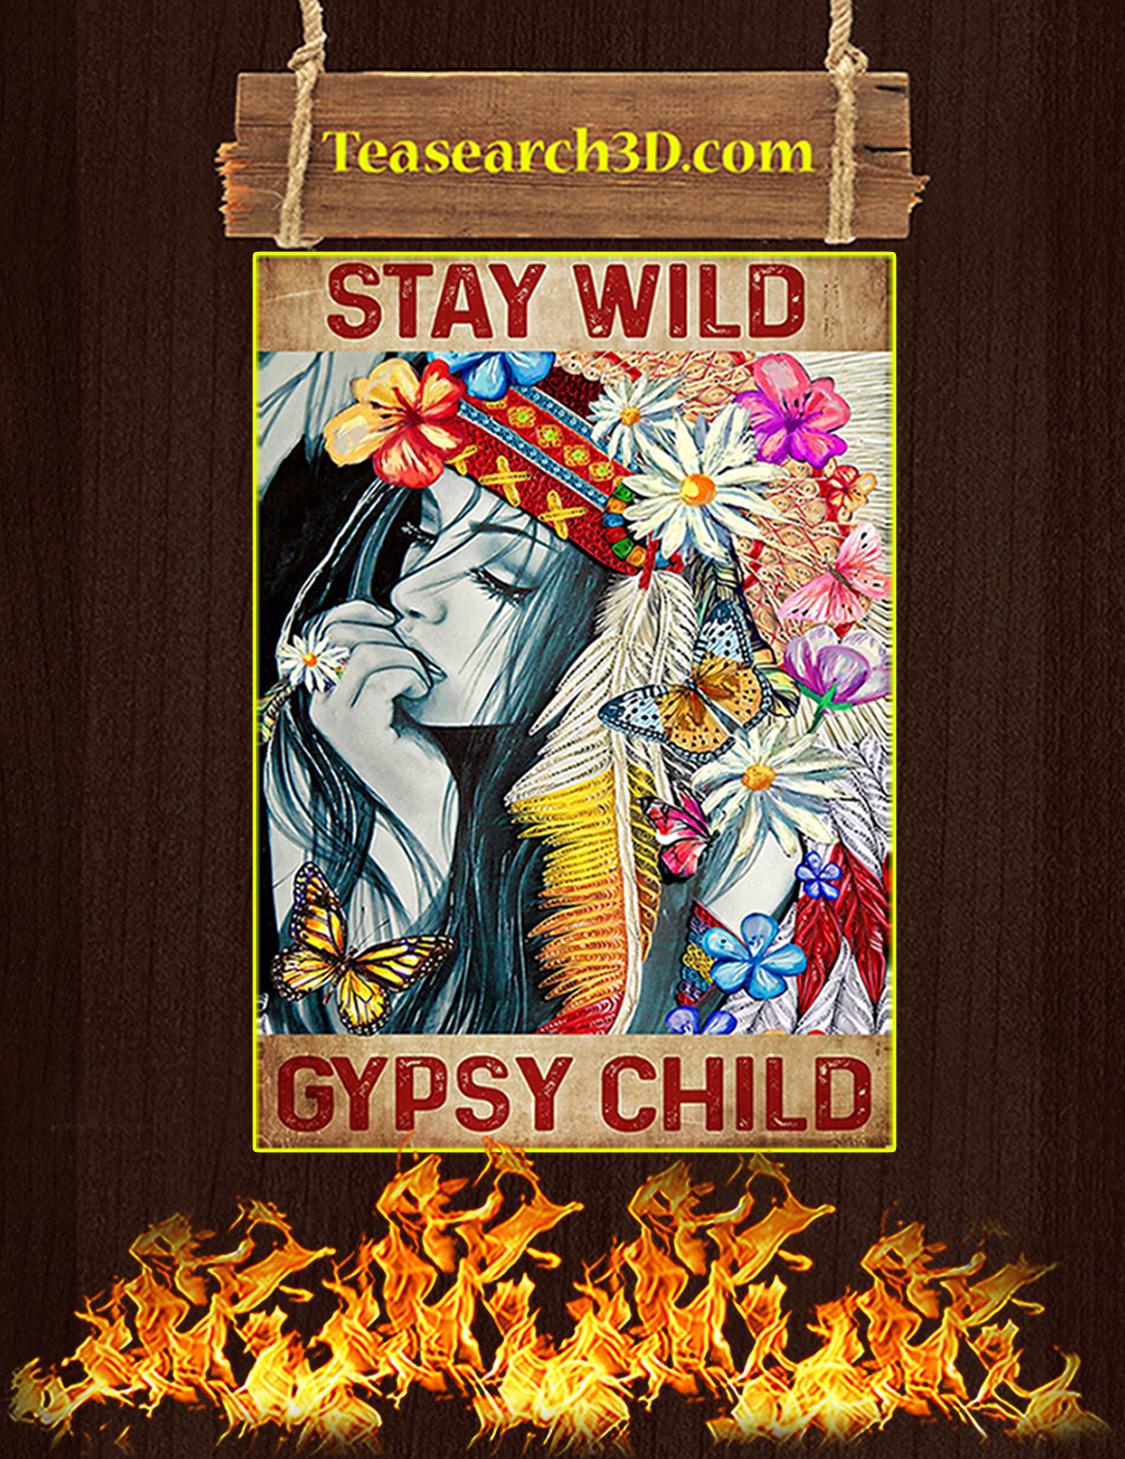 Hippie stay wild gypsy child poster A3